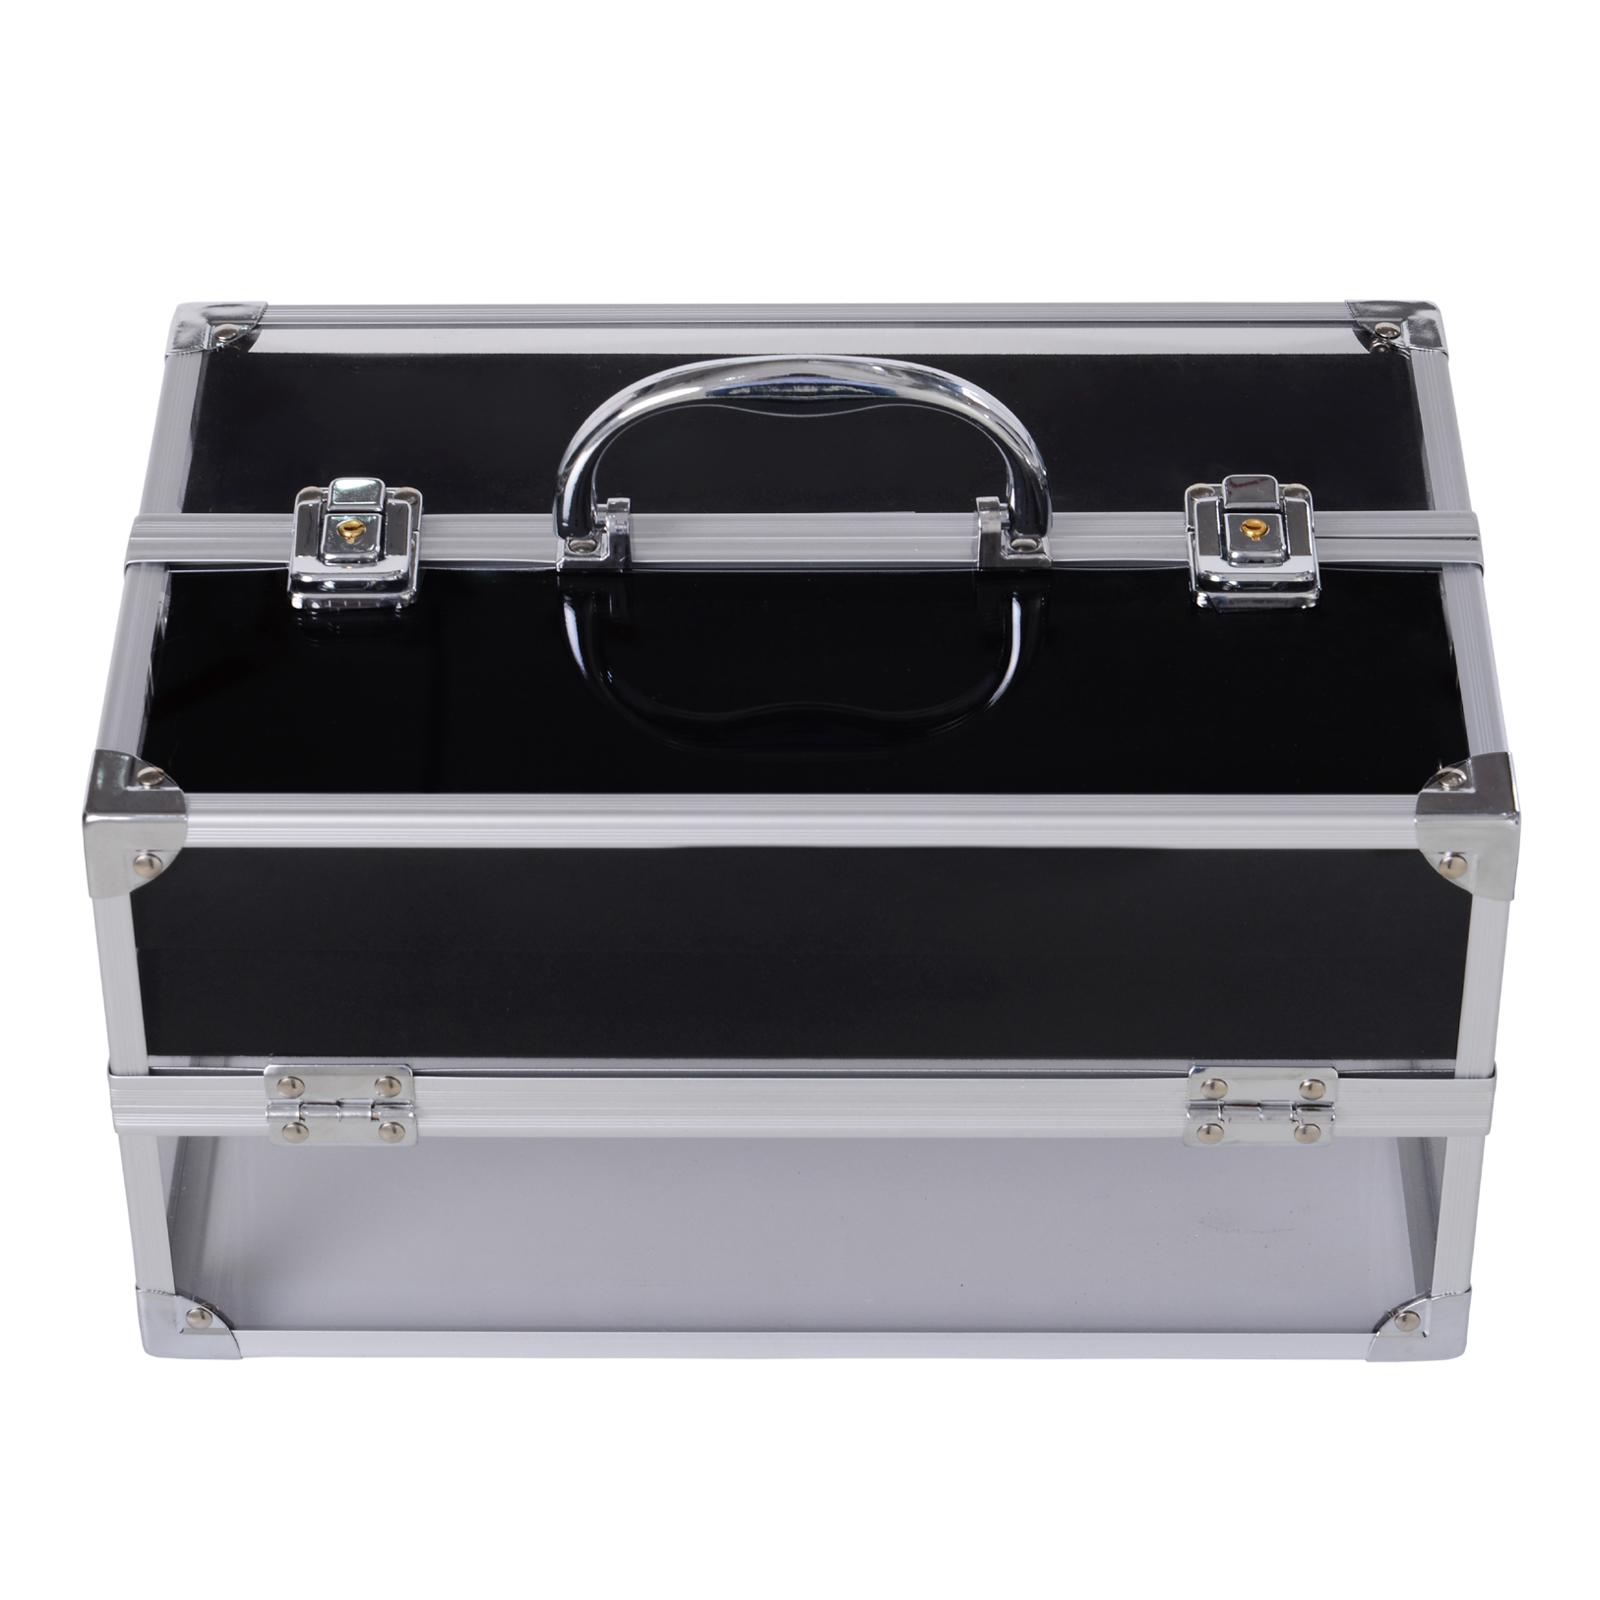 Portable-Makeup-Case-Train-Case-Lockable-Aluminum-with-4-Trays thumbnail 23